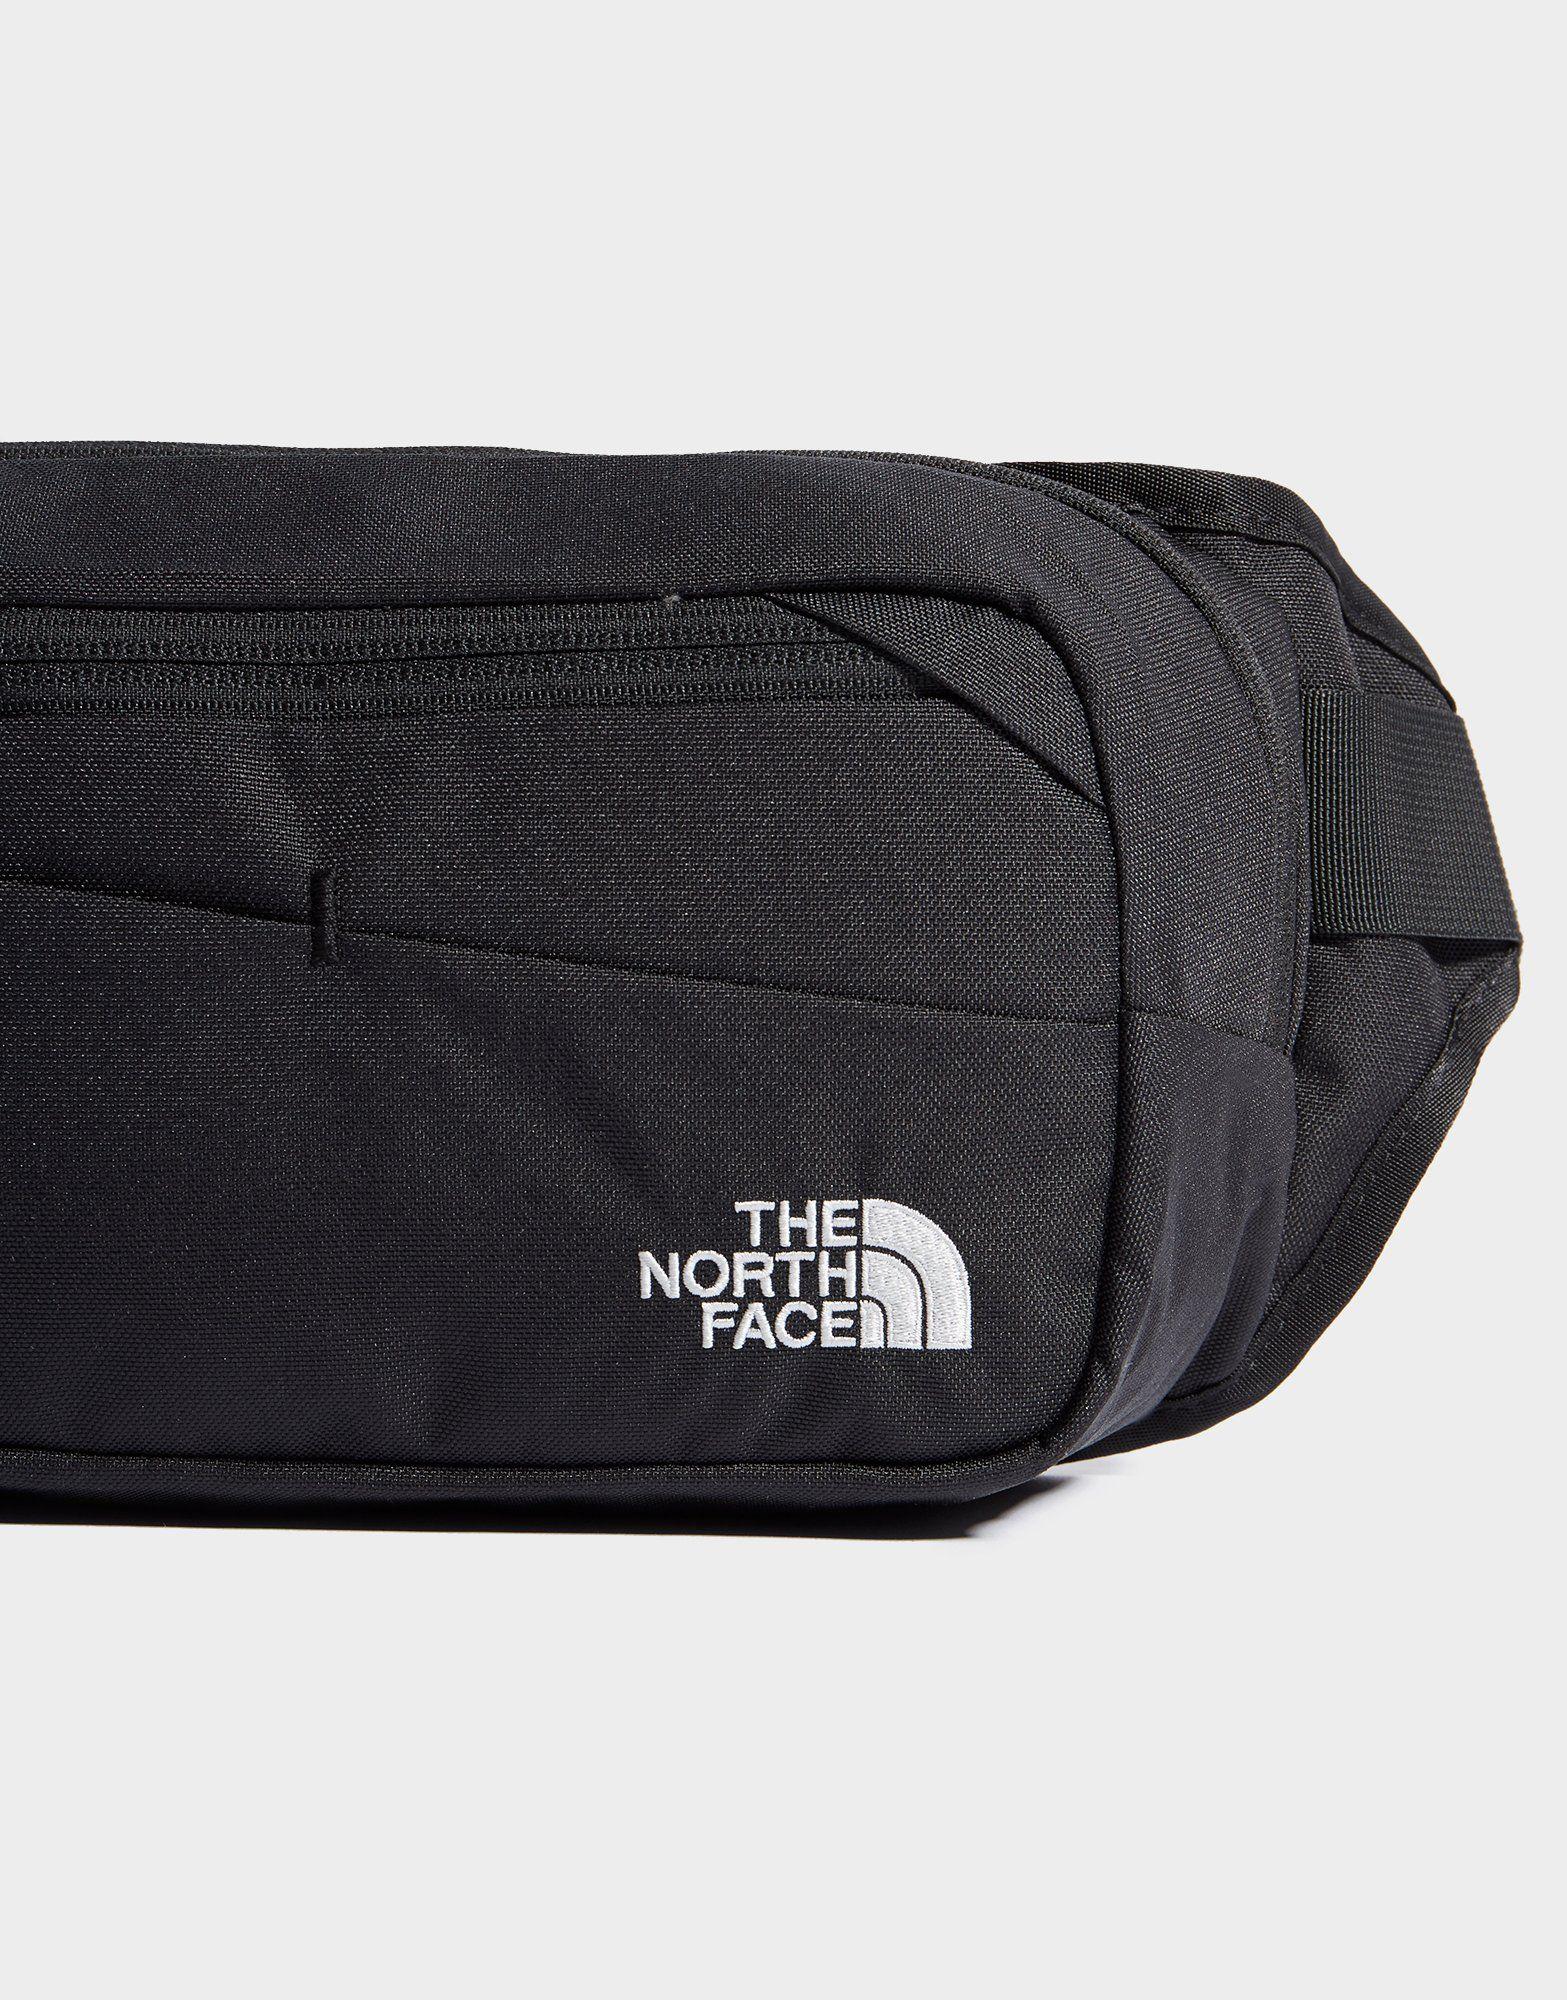 The North Face riñonera Bozer